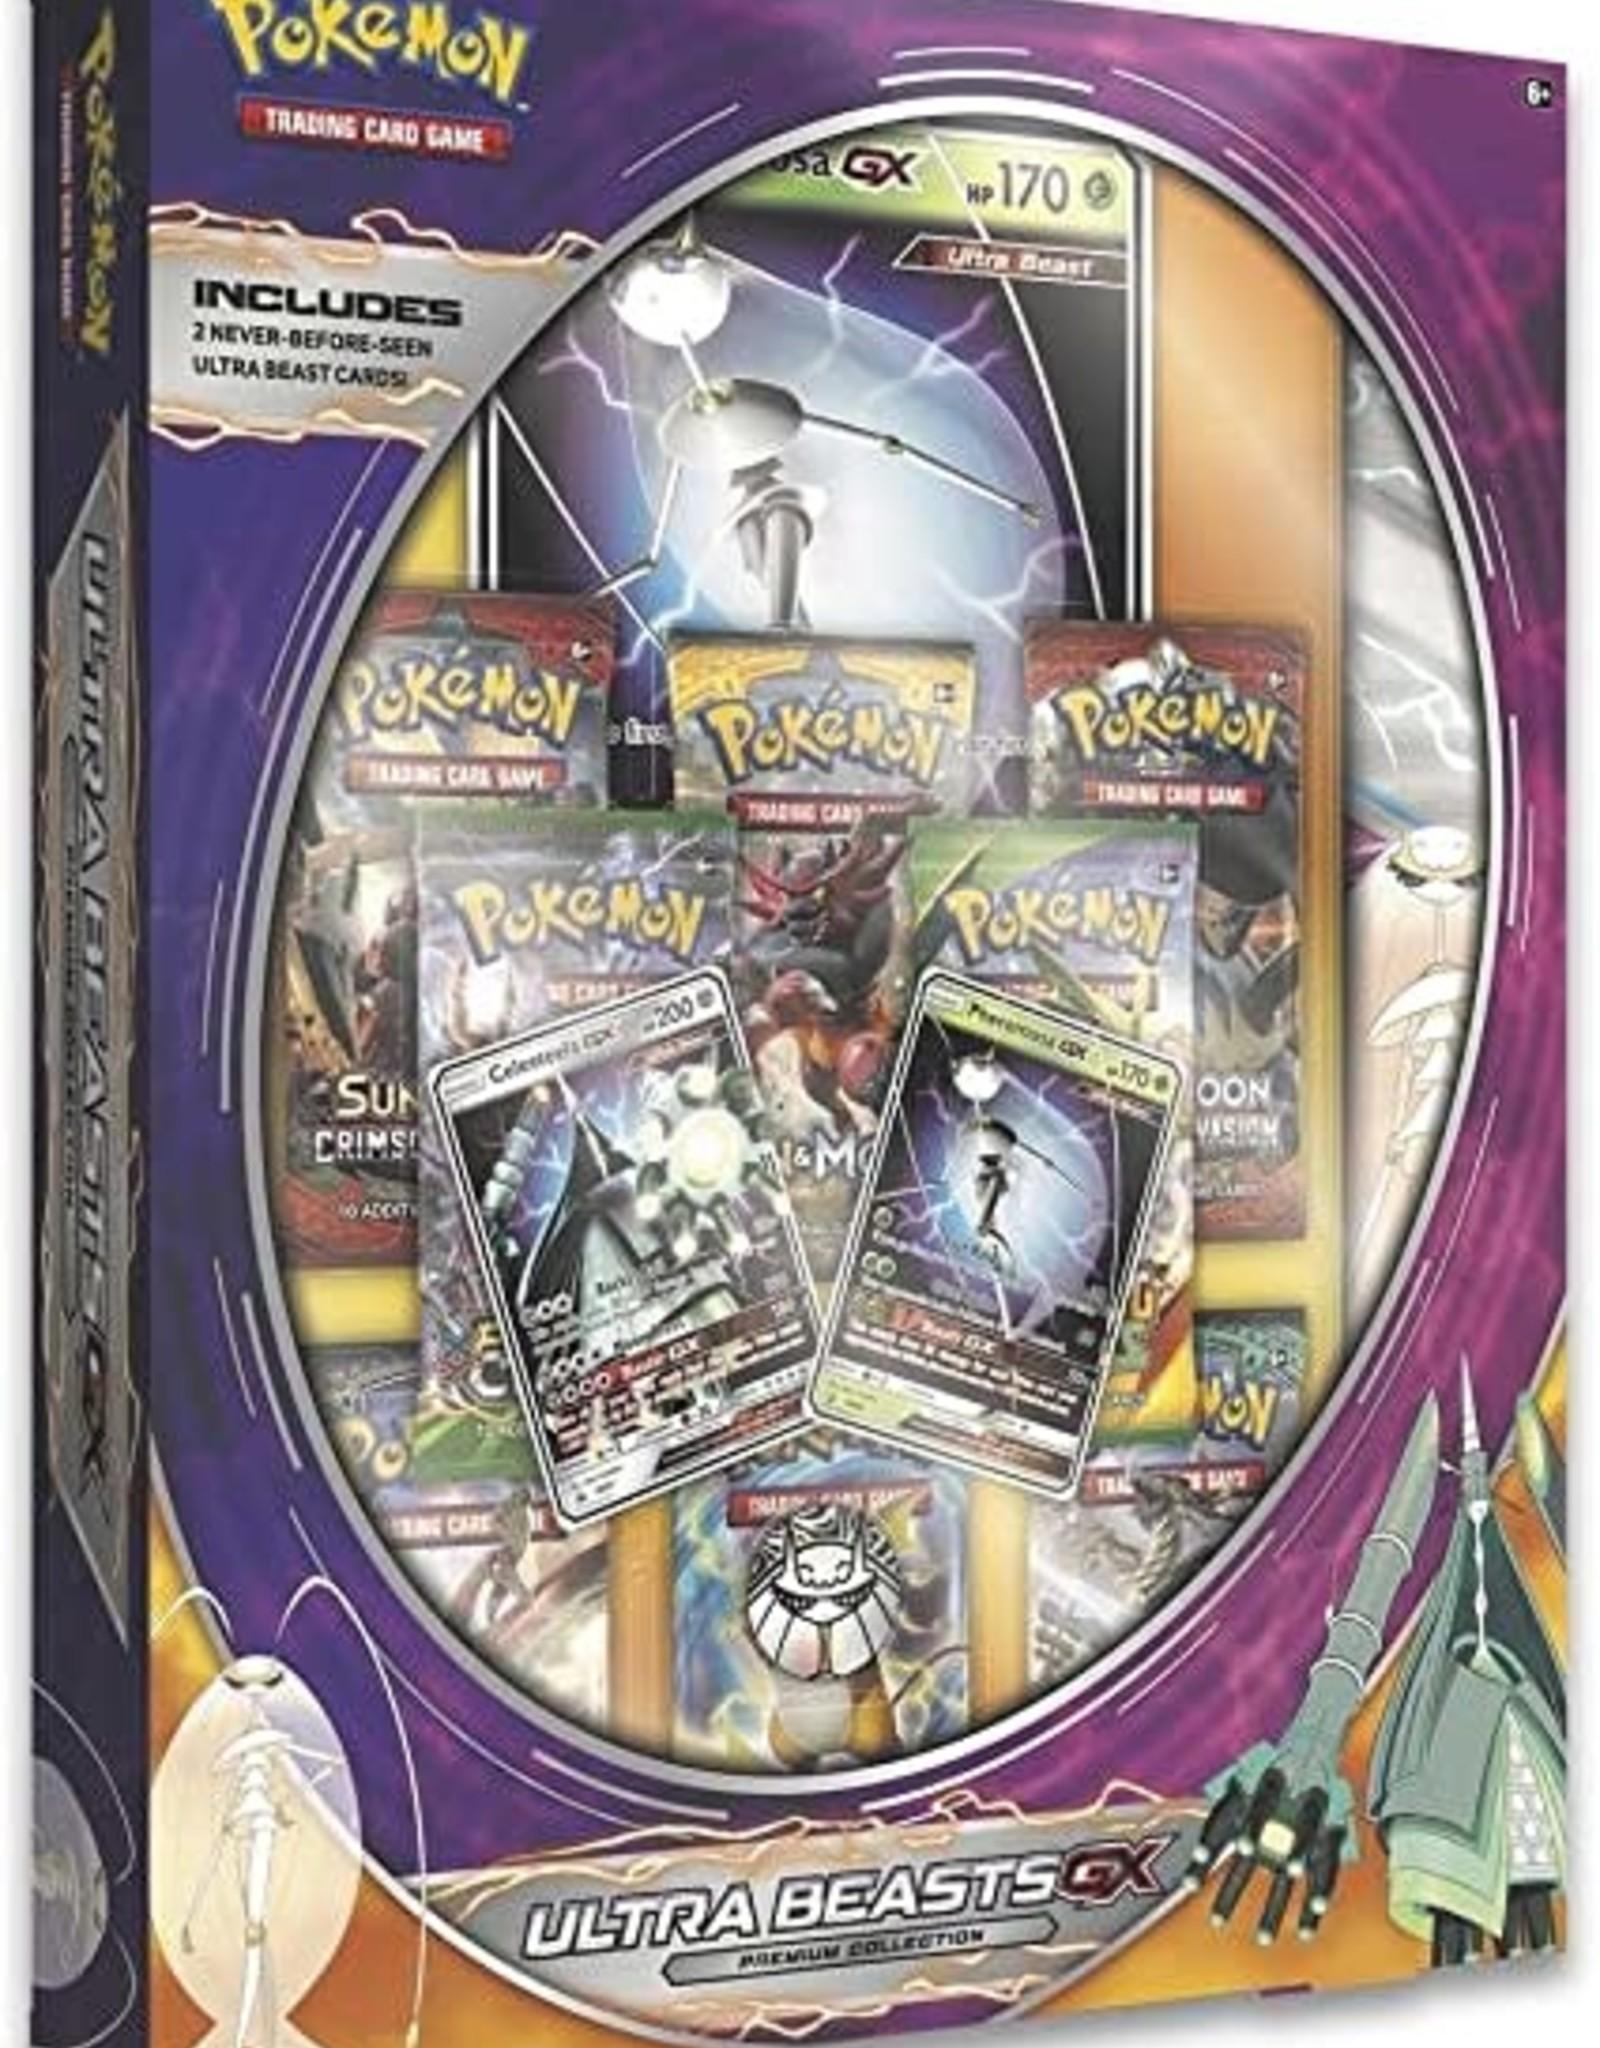 Pokemon Pokemon Ultra Beast GX Premium Collection - Purple